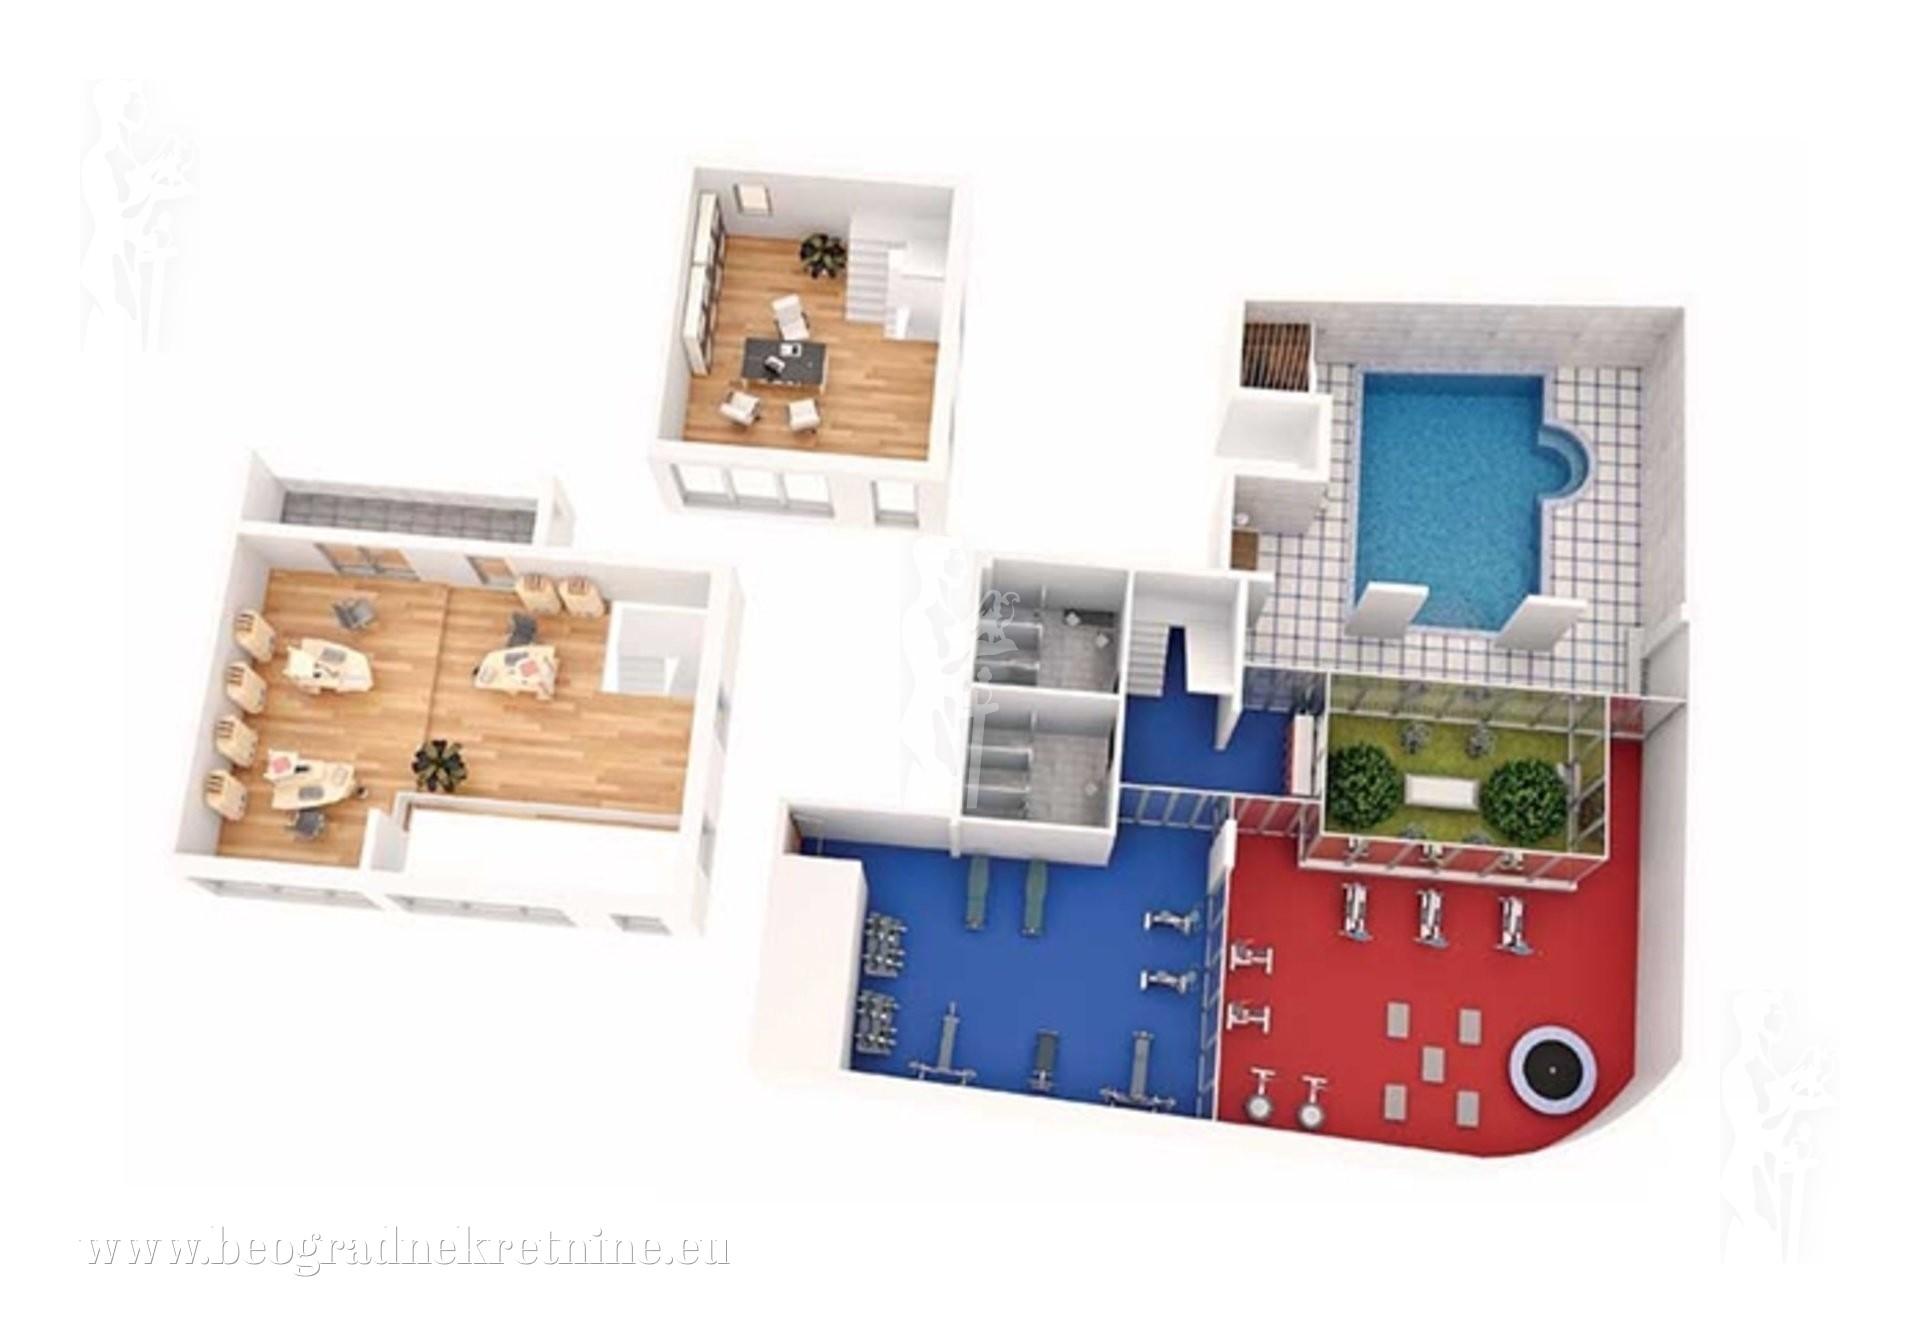 Lux PP za Spa ili klub sa bazenom 315m2 2 garaže